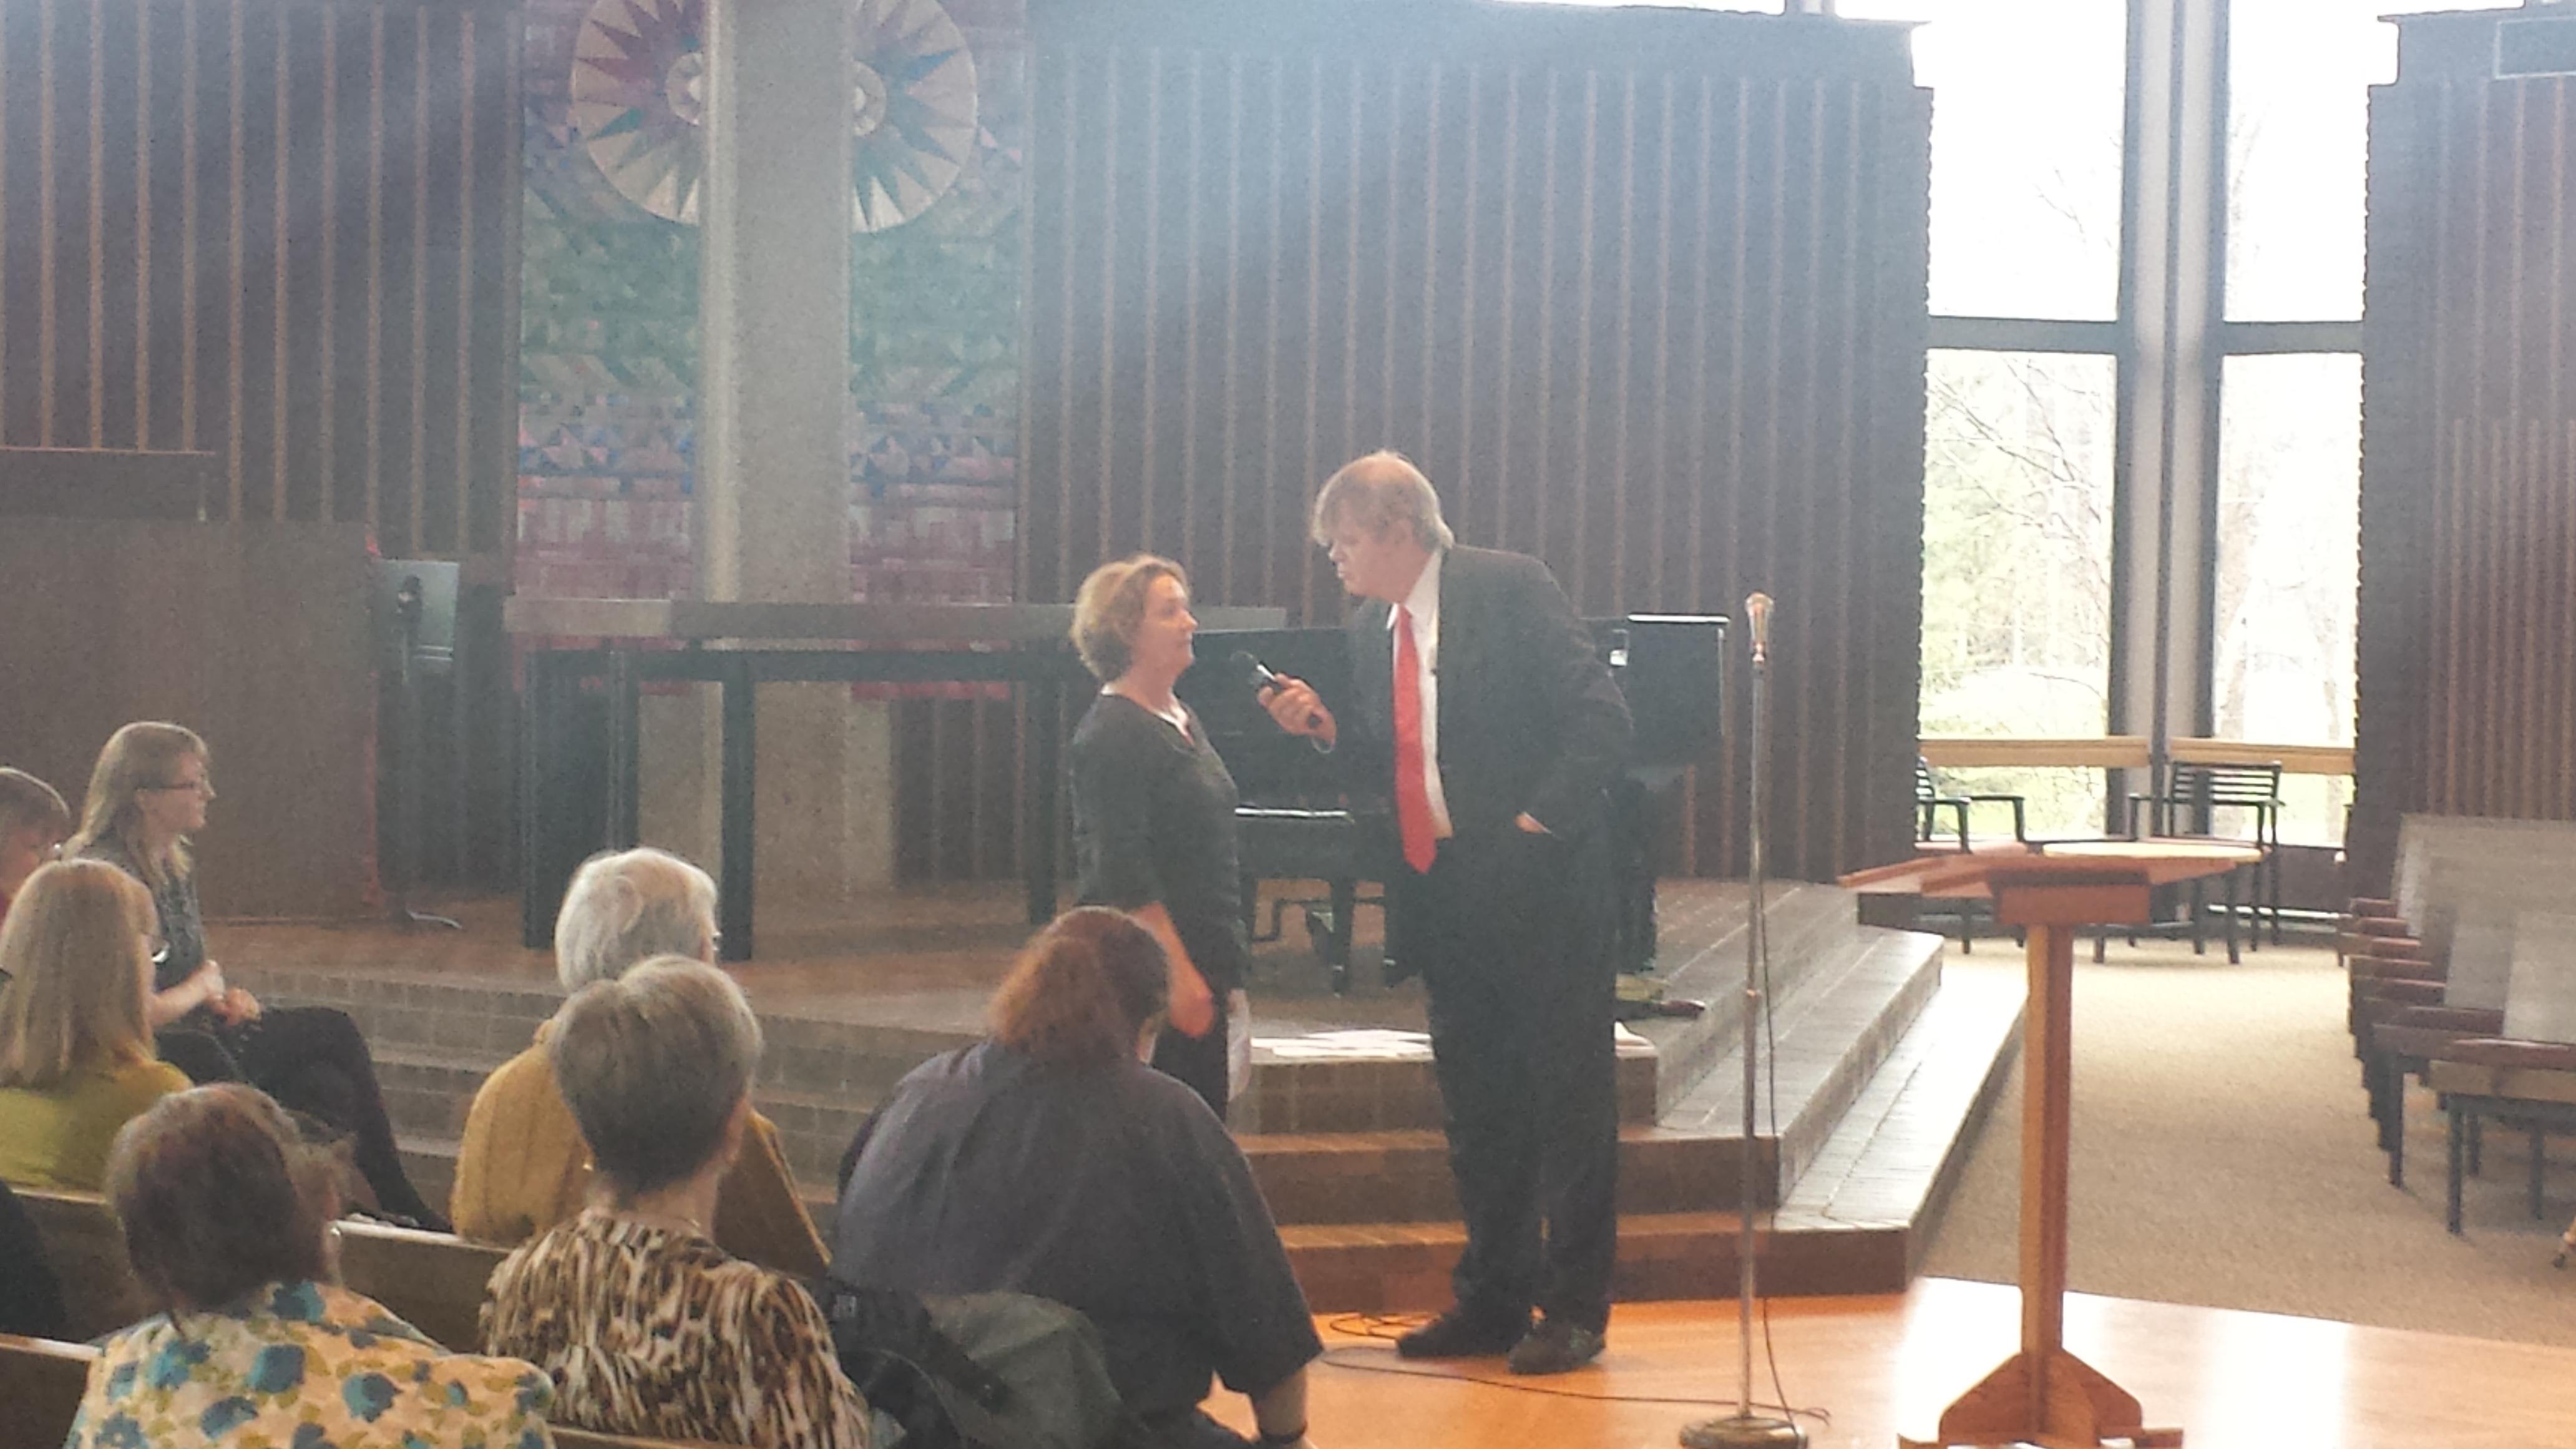 Garrison Keillor interviews Kristal Leebrick on Sunday.